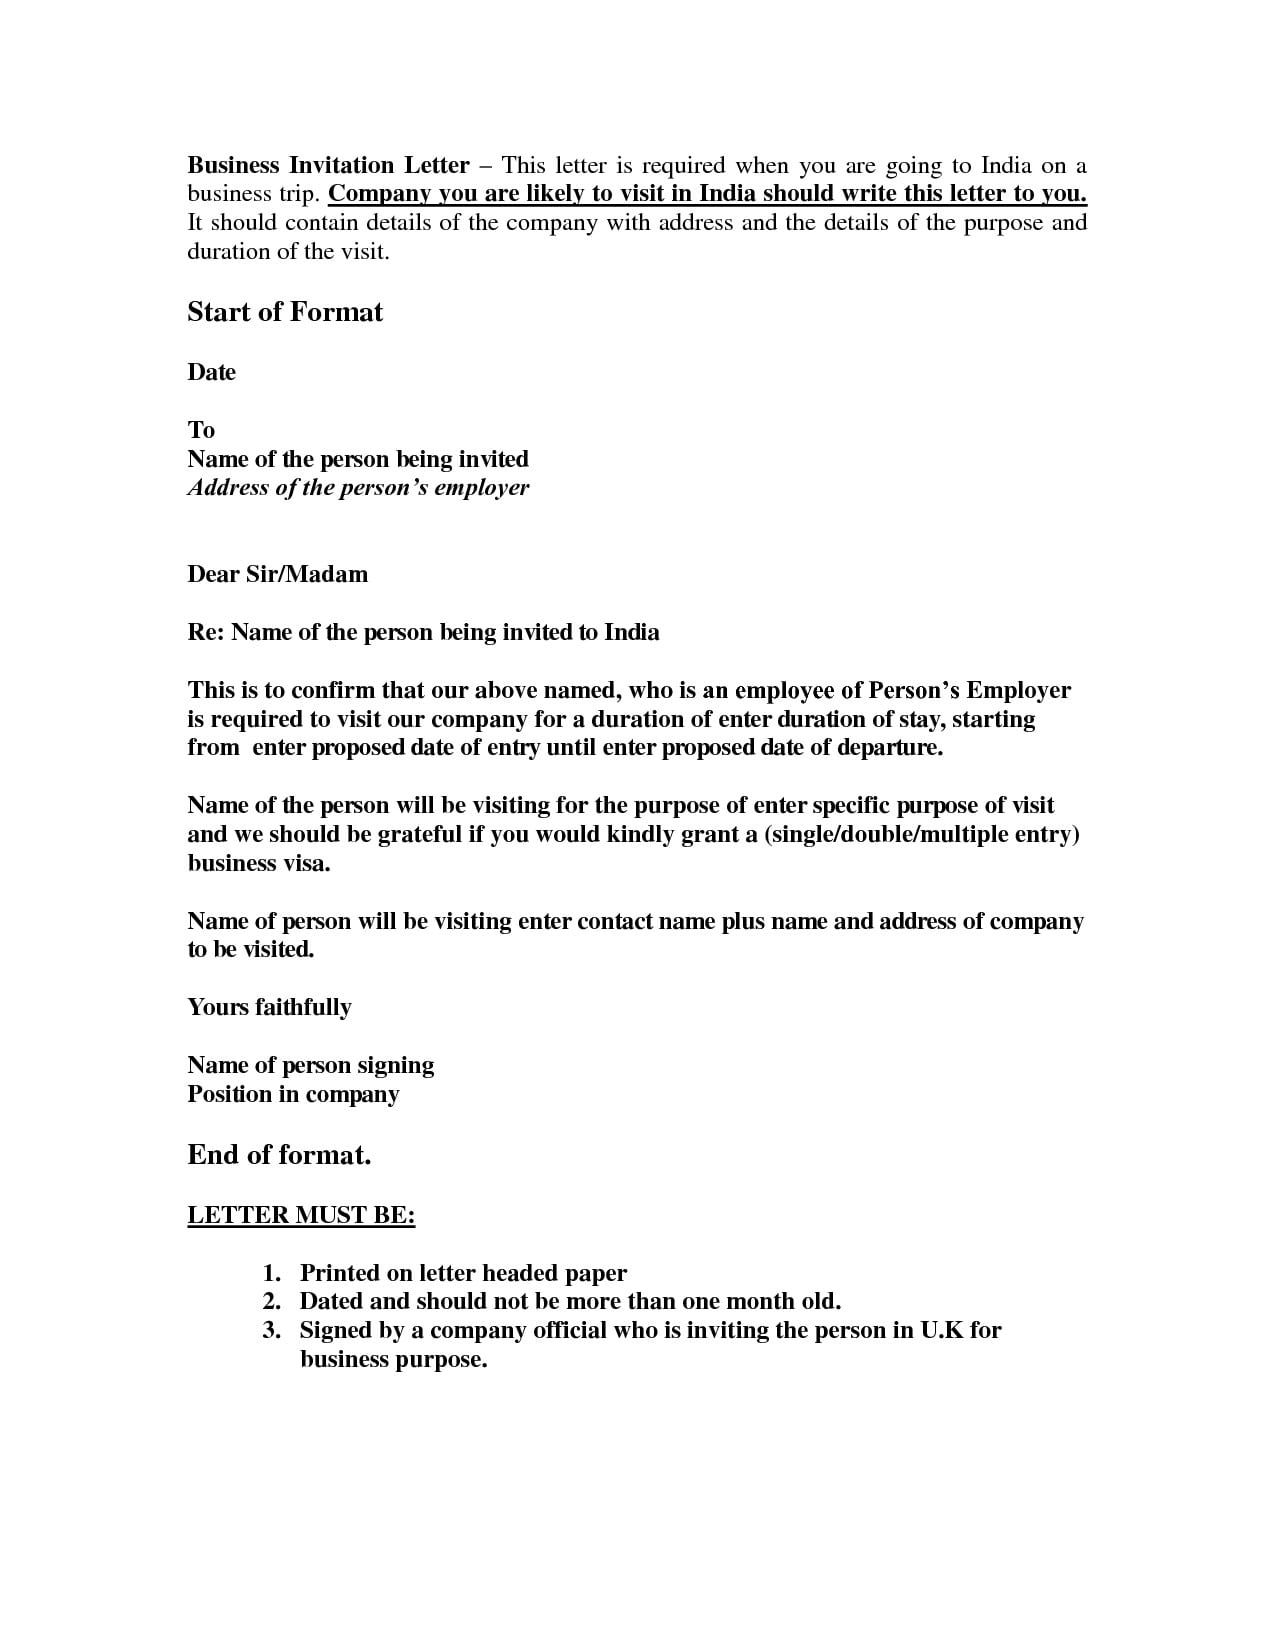 Sample Of Invitations Letter For Business Visa Business